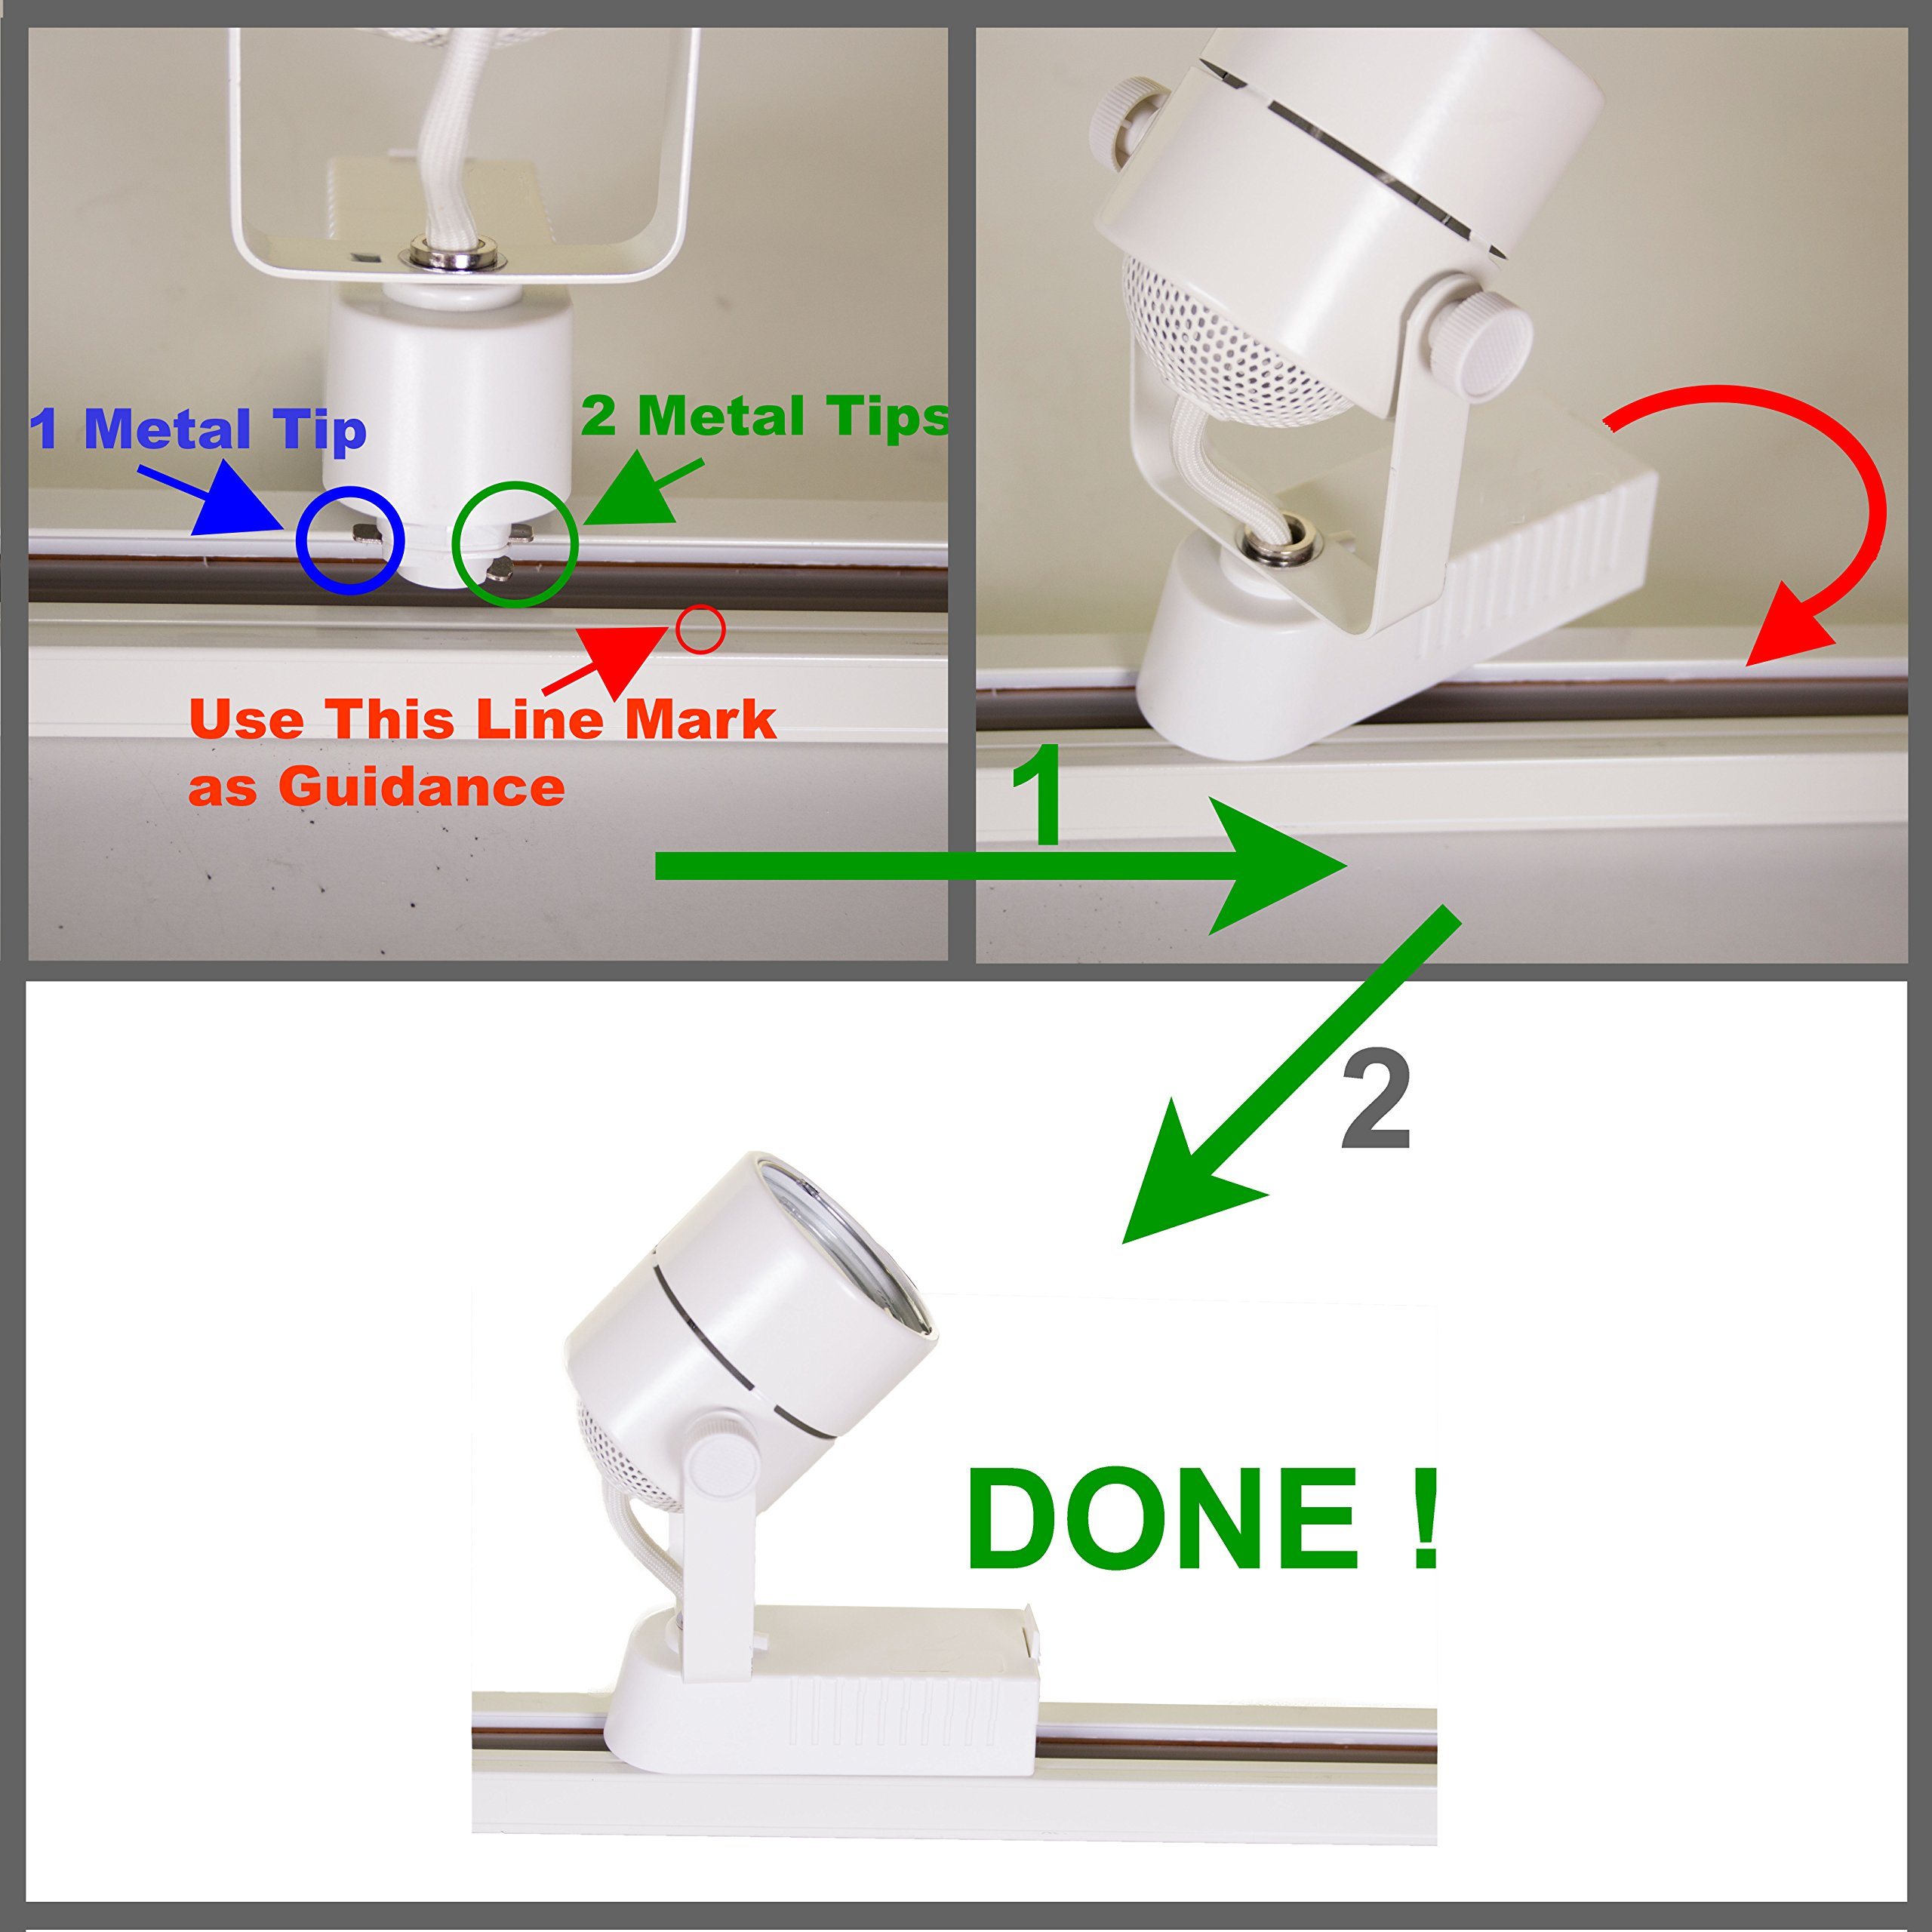 Direct-Lighting 50016 White MR16 Gimbal Ring Low Voltage Track Lighting Head by Direct-Lighting (Image #1)